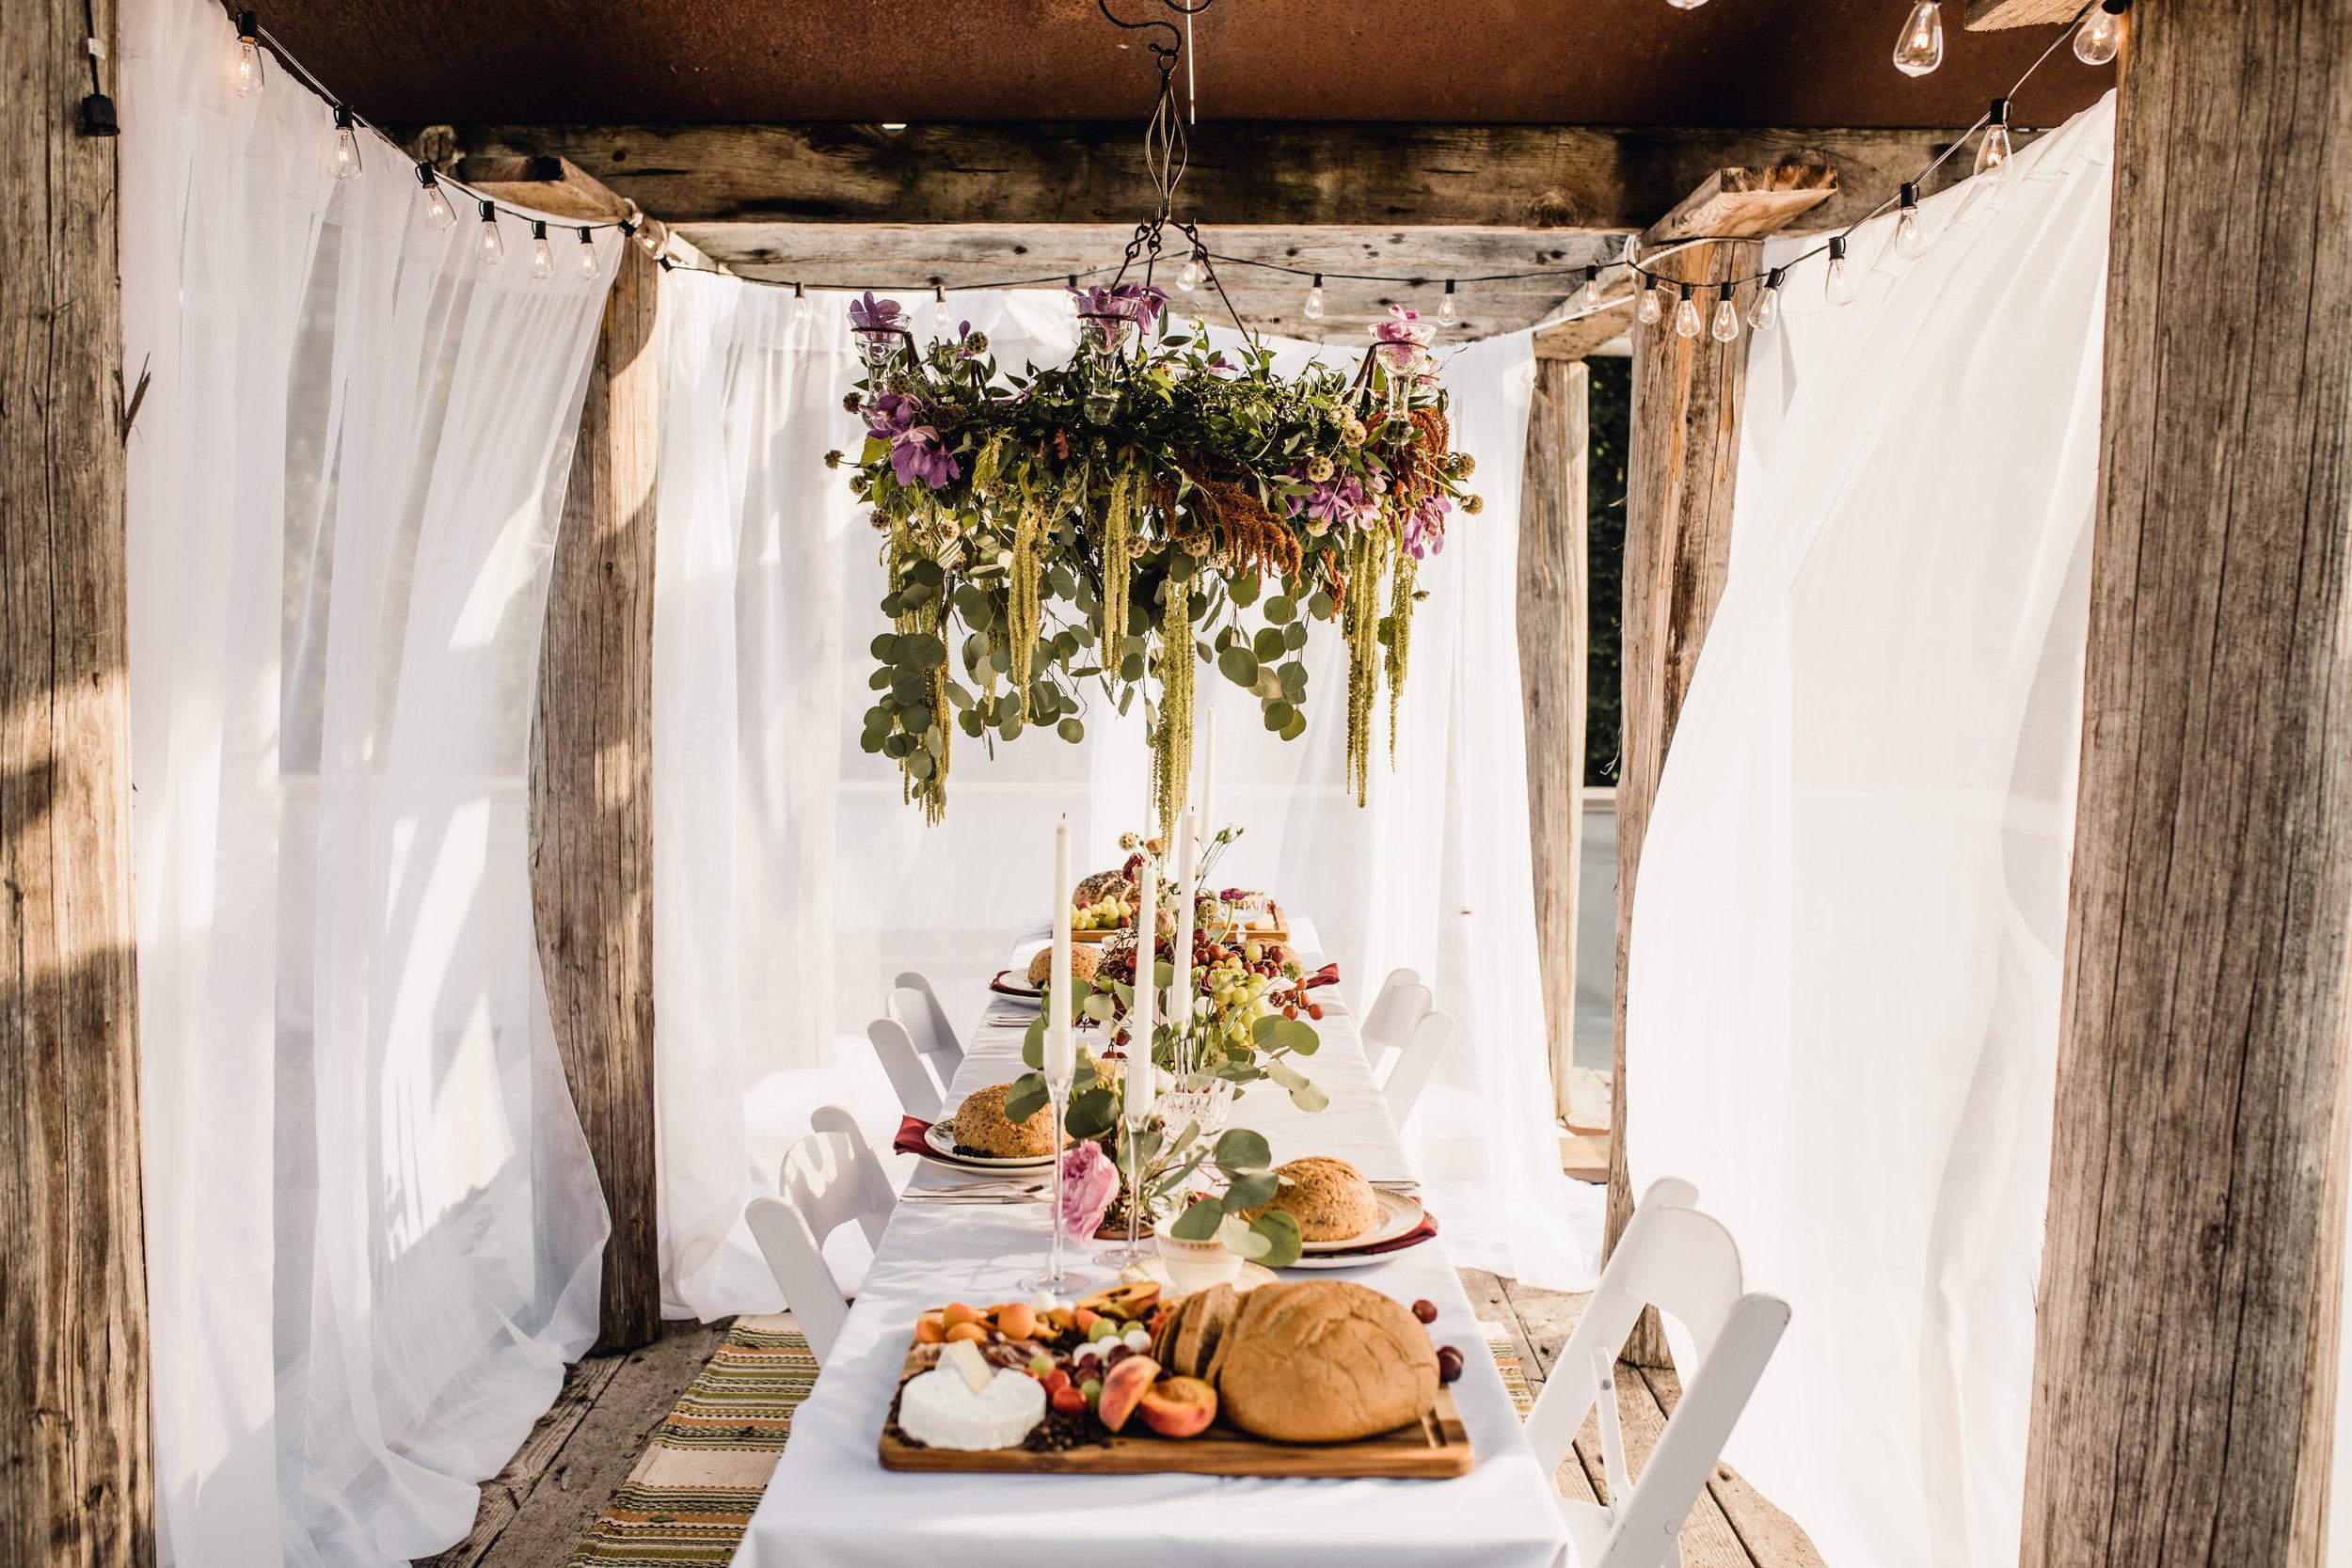 Moonlight Party Rentals, Jennifer Joyce Florals, Givens Farm